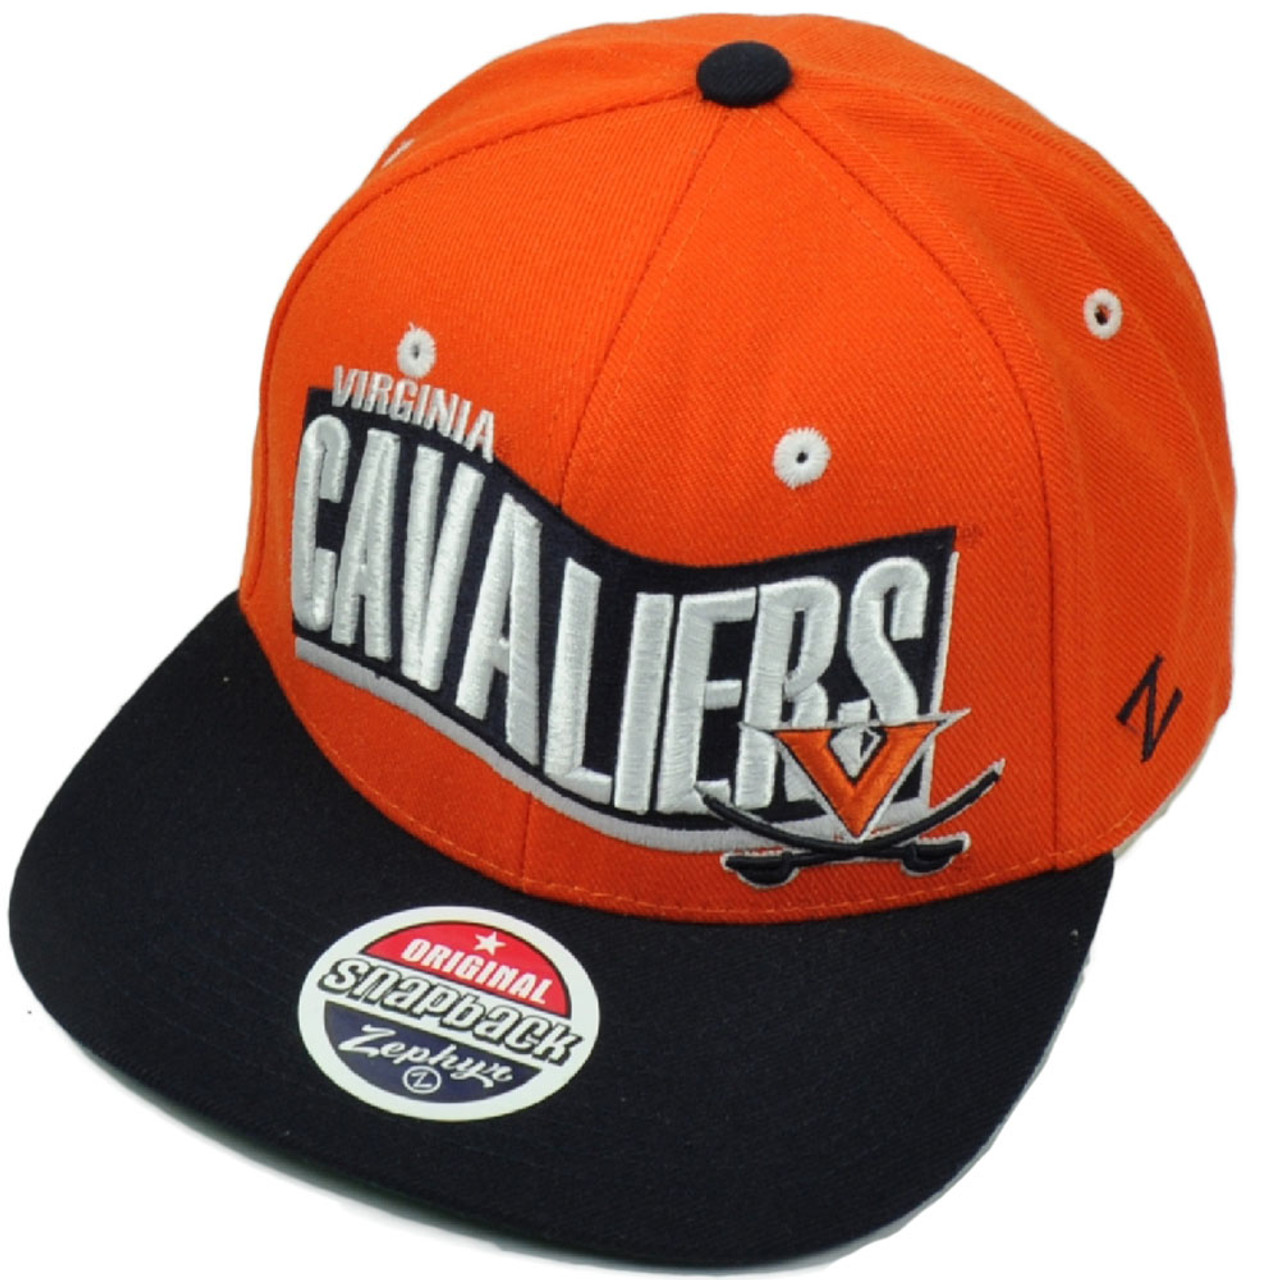 super popular d91ac 0c5e0 NCAA Virginia Cavaliers Zephyr Rally 32 5 Flat Bill Snapback Orange Hat Cap  - Cap Store Online.com